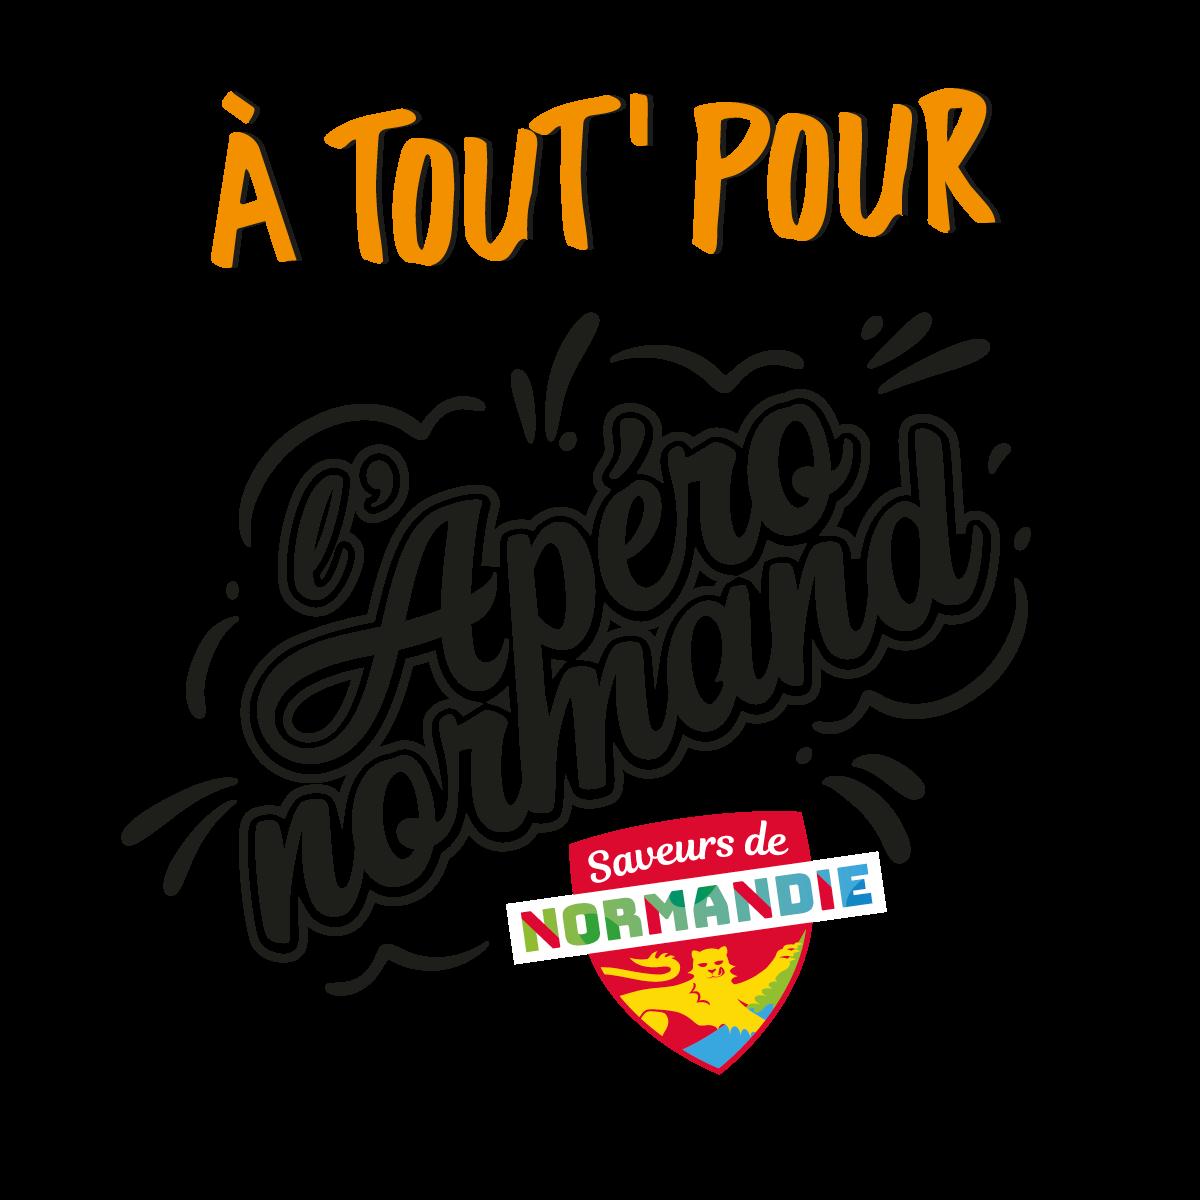 A tout Apéro Normand